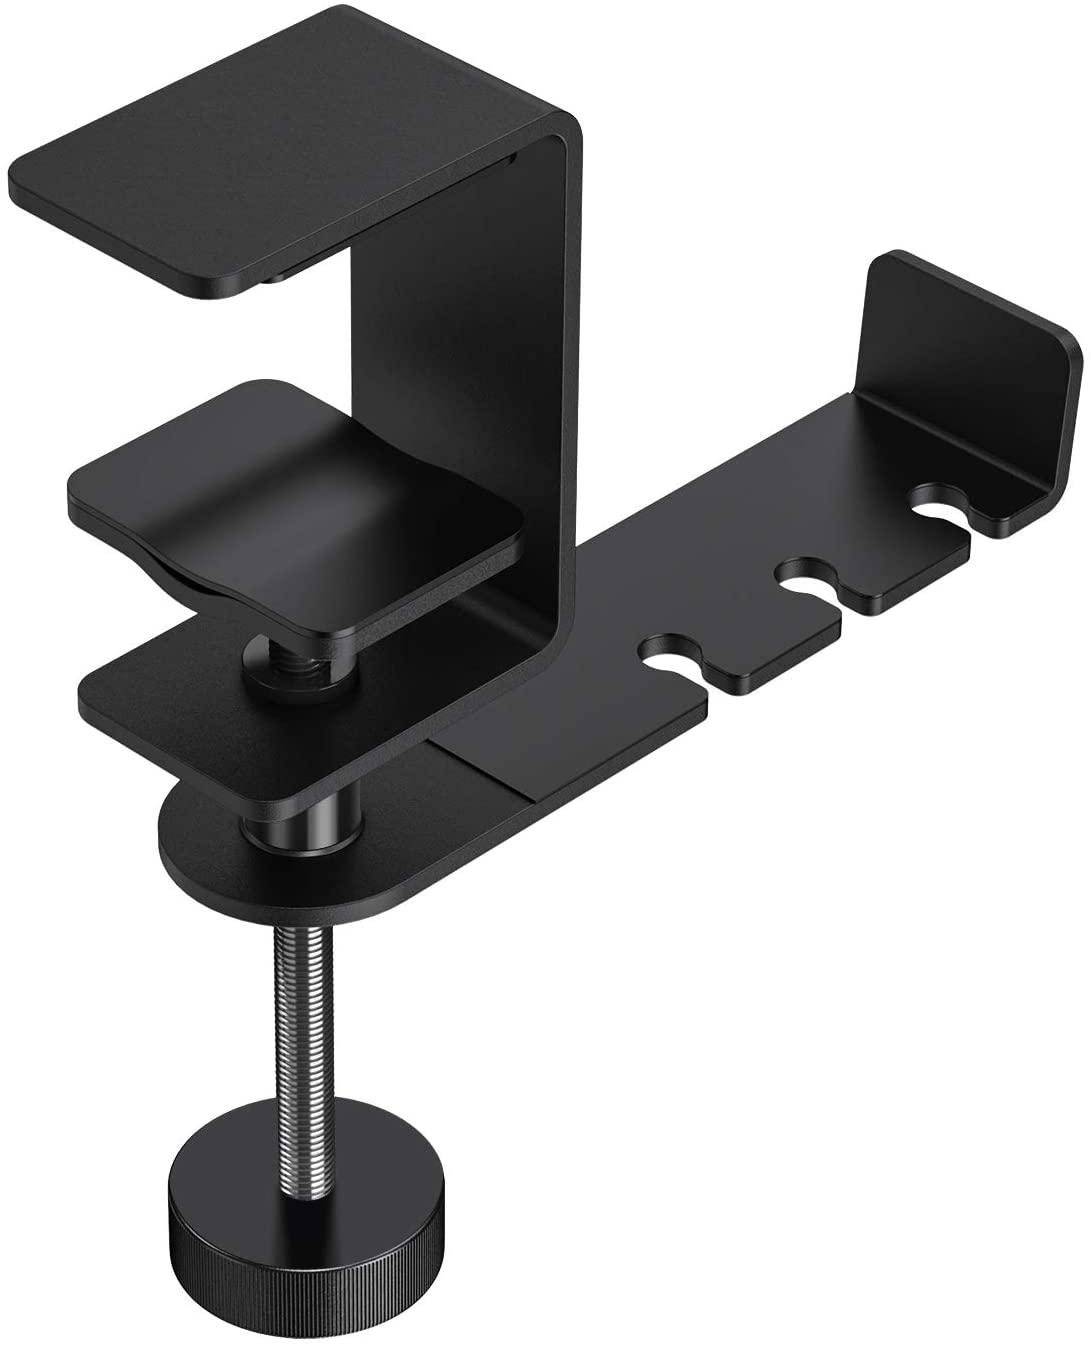 OMOTON Headphone Hanger - 360 Degree Rotation Universal Aluminum Headphone Adjustable Headset Stand Clamp Mount Desk Hook Holder Fits All Headphone Sizes